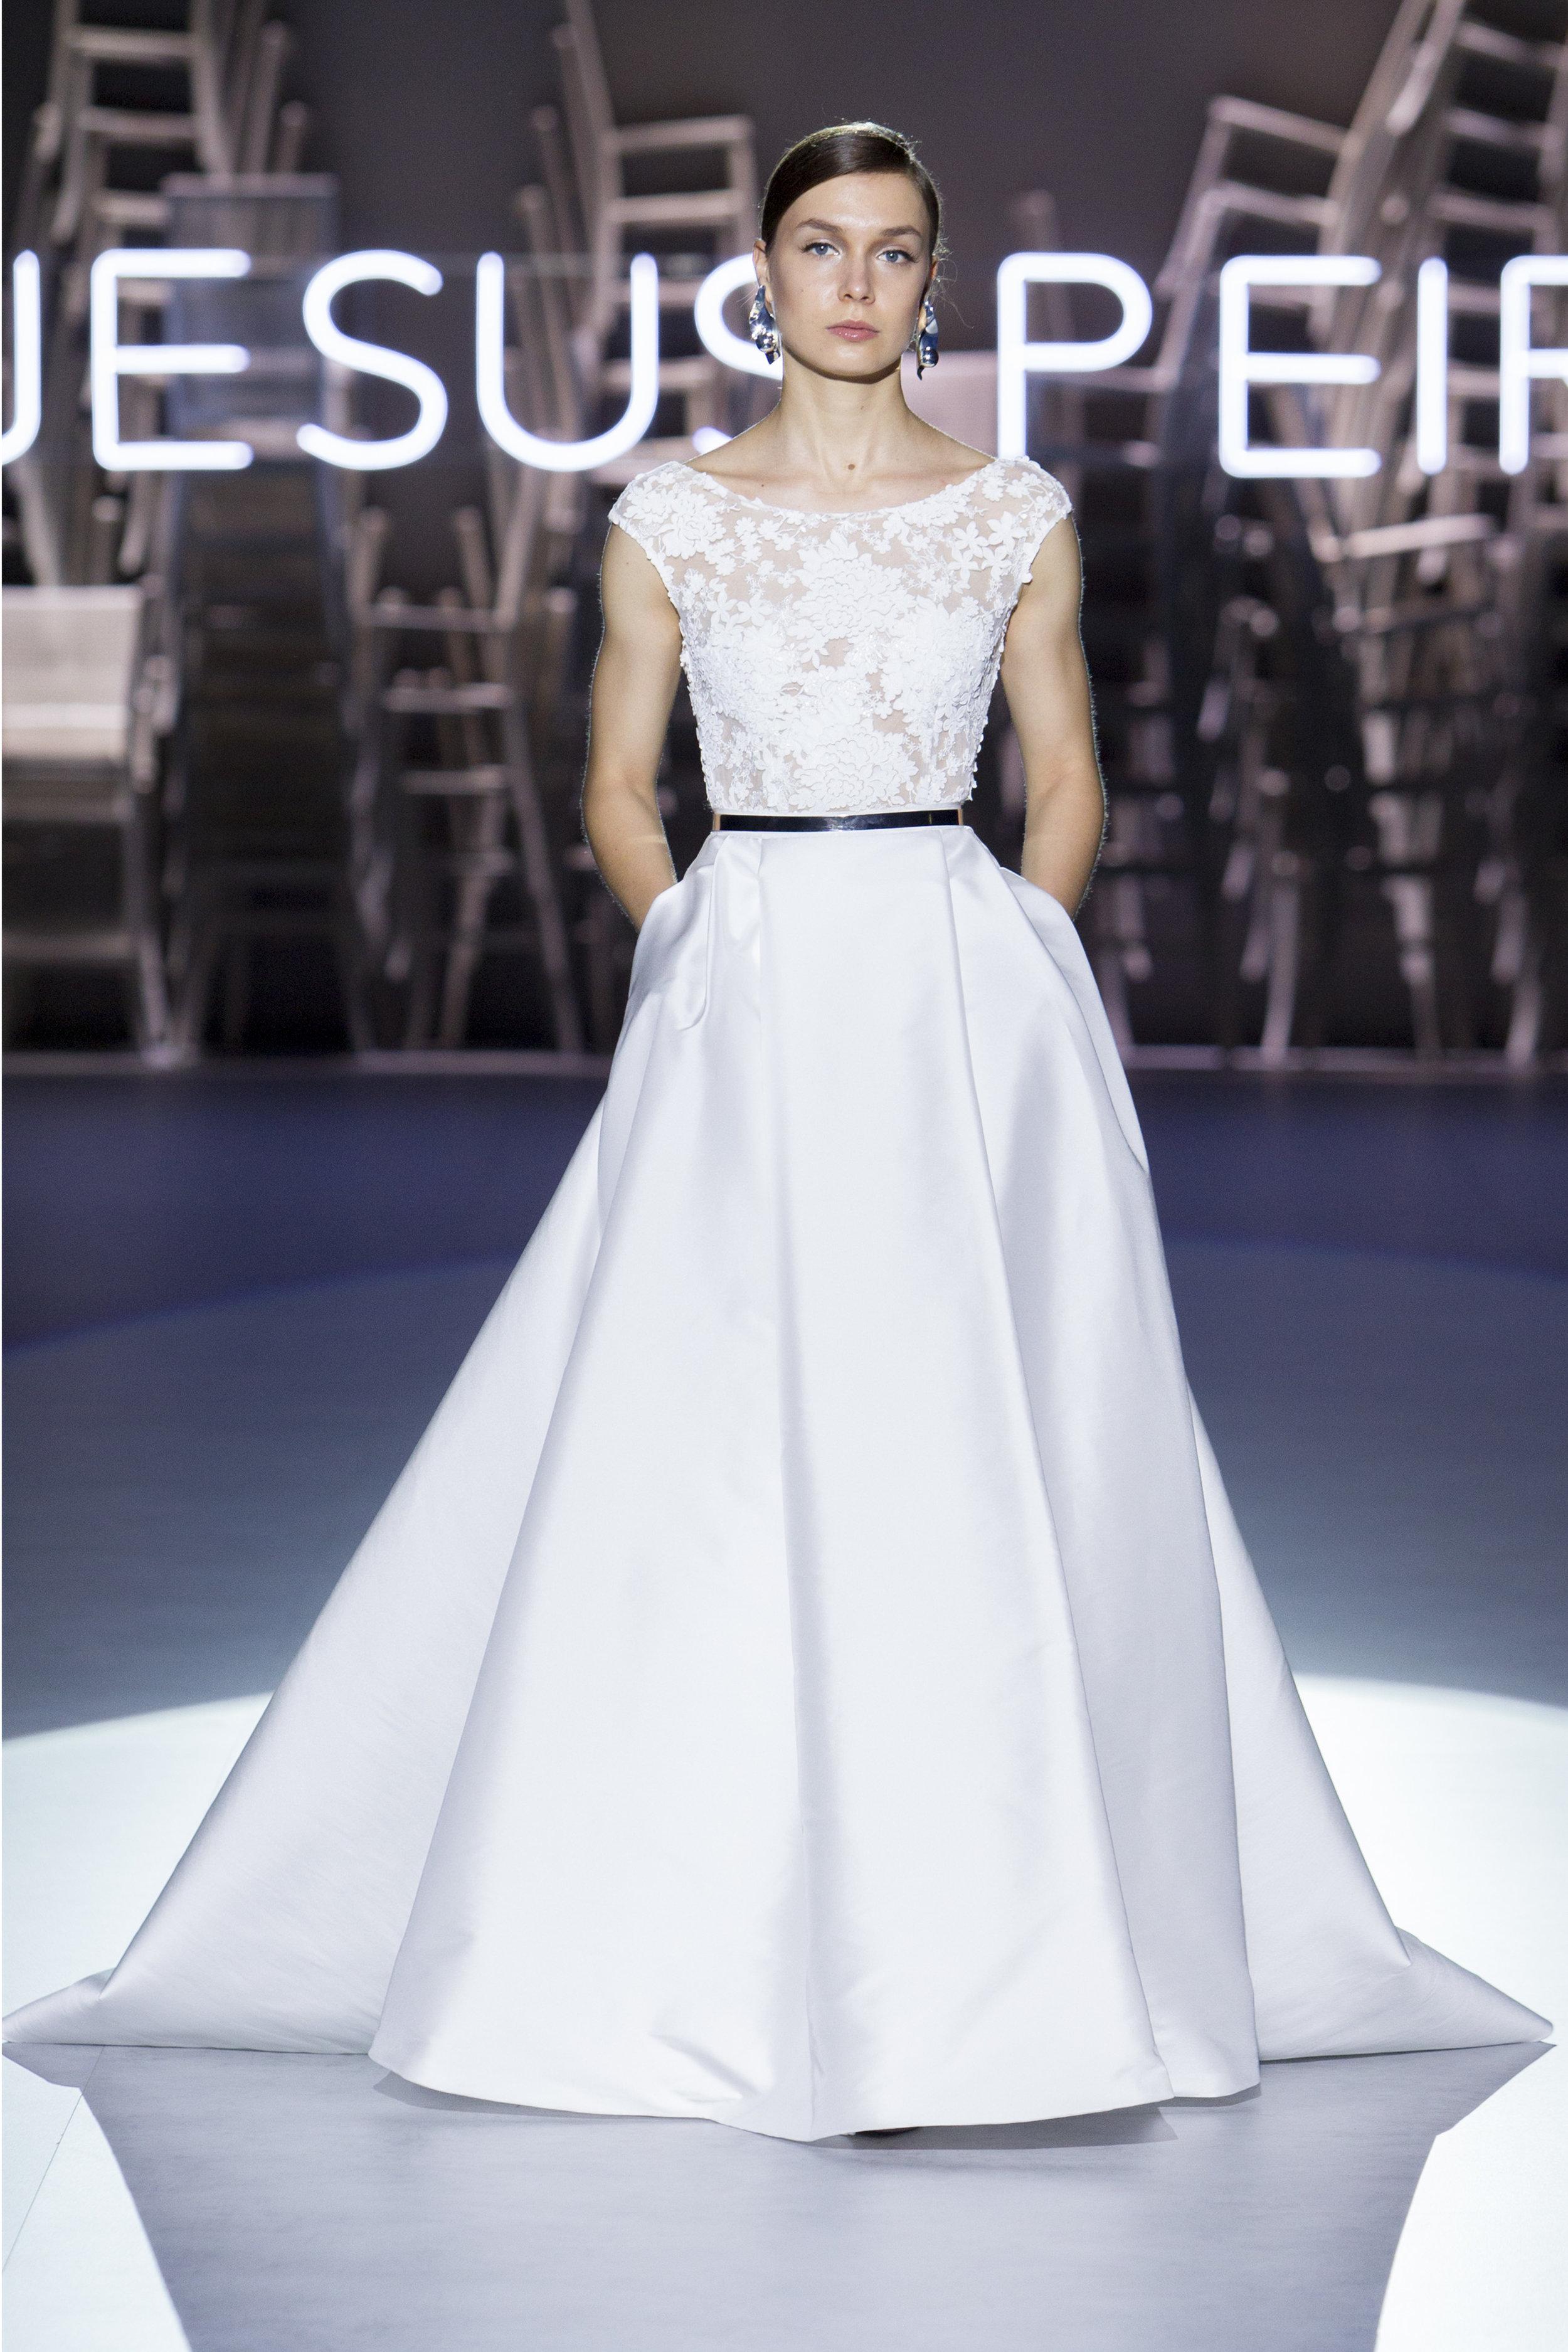 Vestido: Jesús Peiró / Pasarela:  Valmont Barcelona Bridal Fashion Week